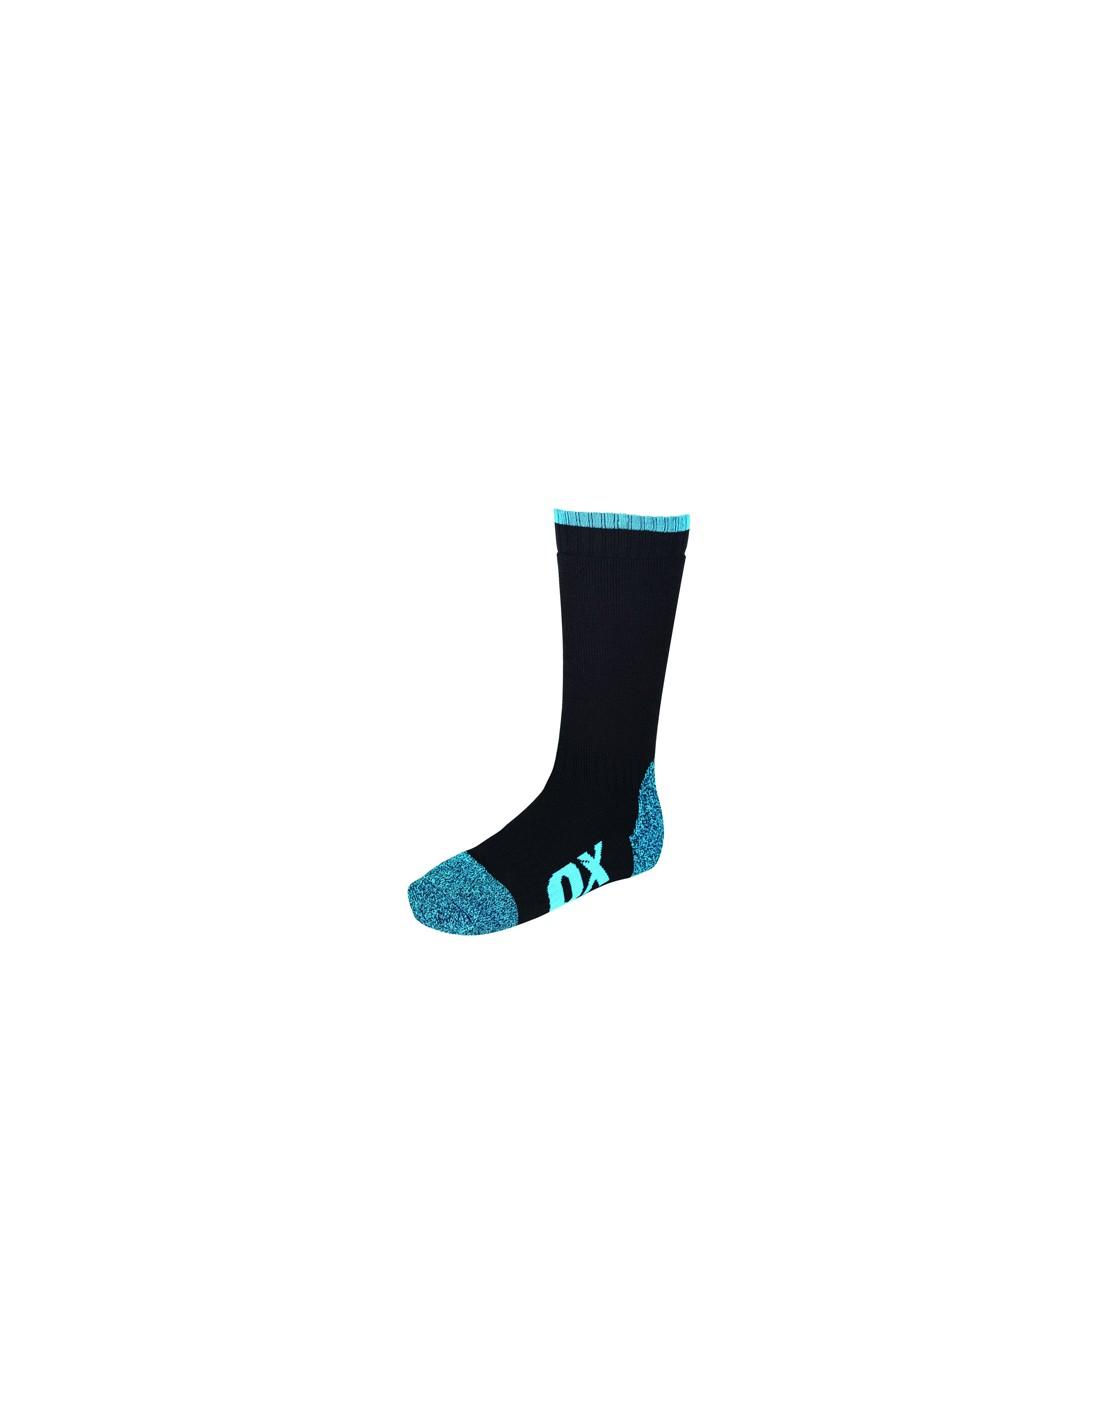 OX W551001 Tough Work Socks 1 Pair SALE PRICE